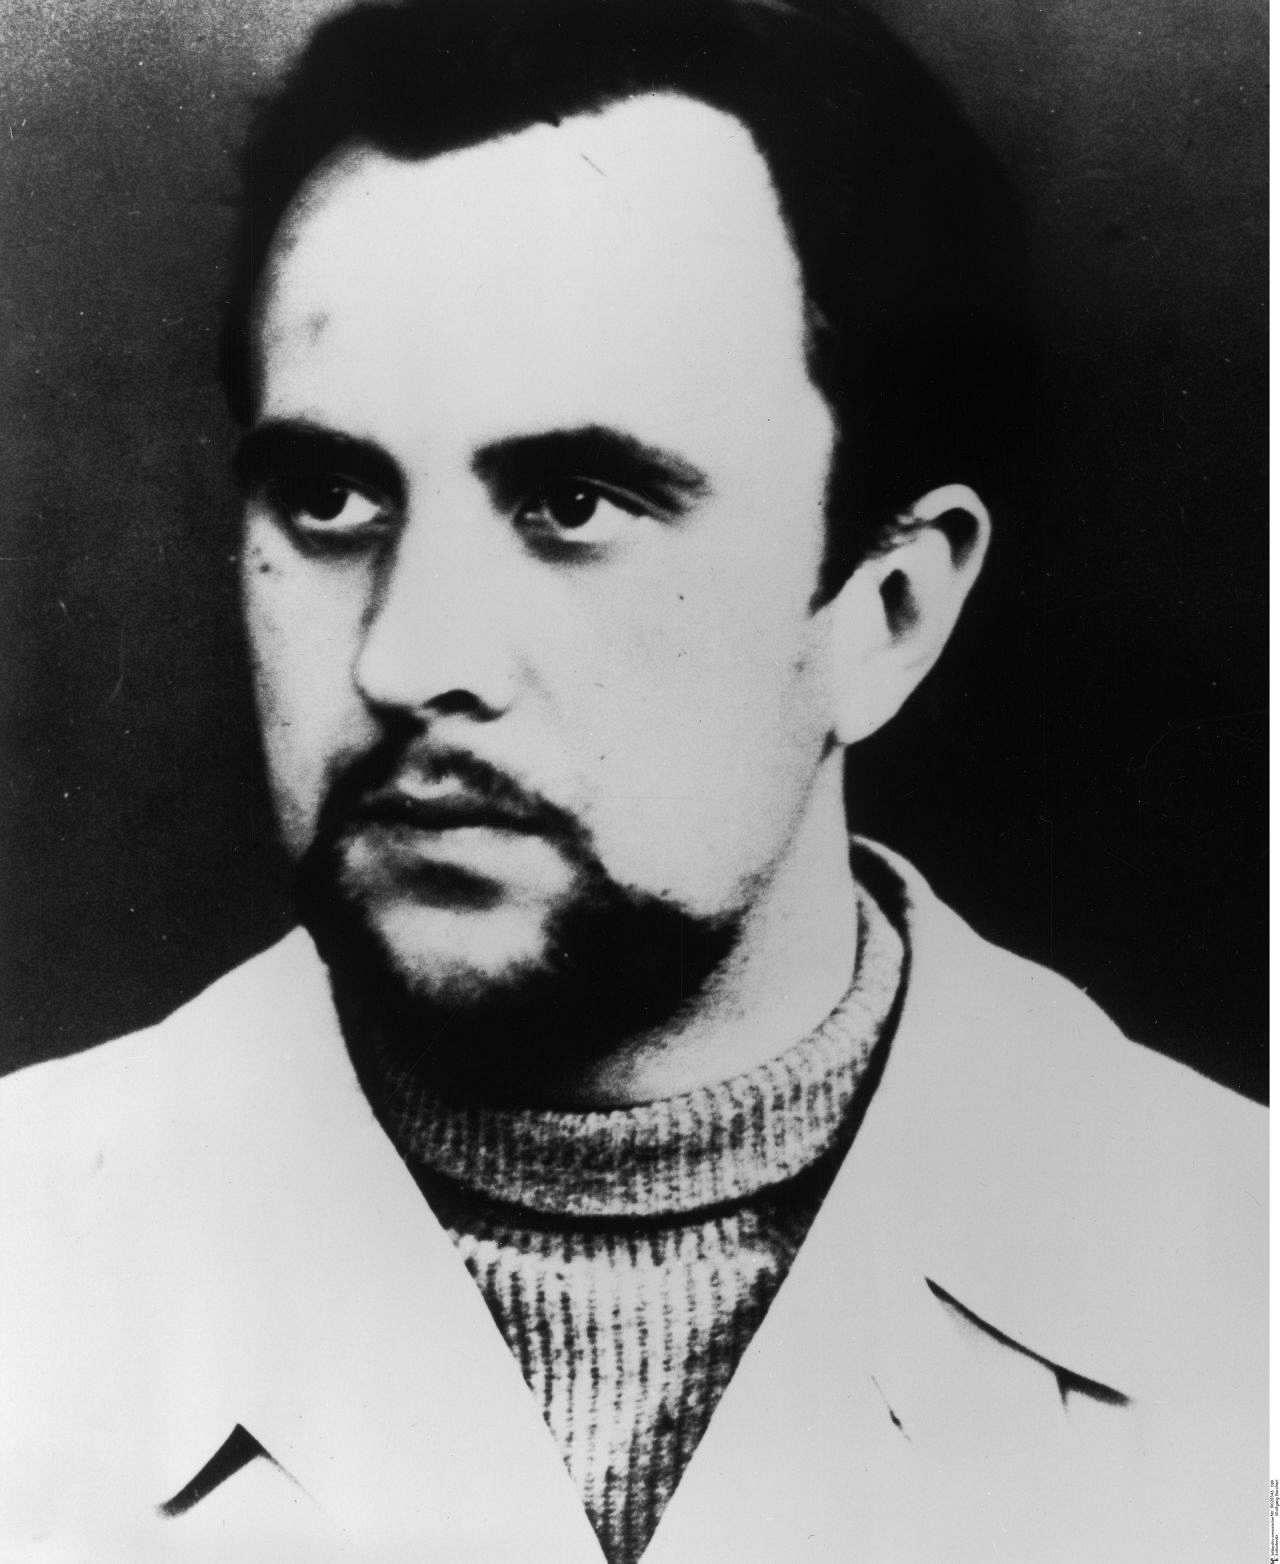 portrtfoto des schriftstellers wolfgang borchert 1945 - Wolfgang Borchert Lebenslauf